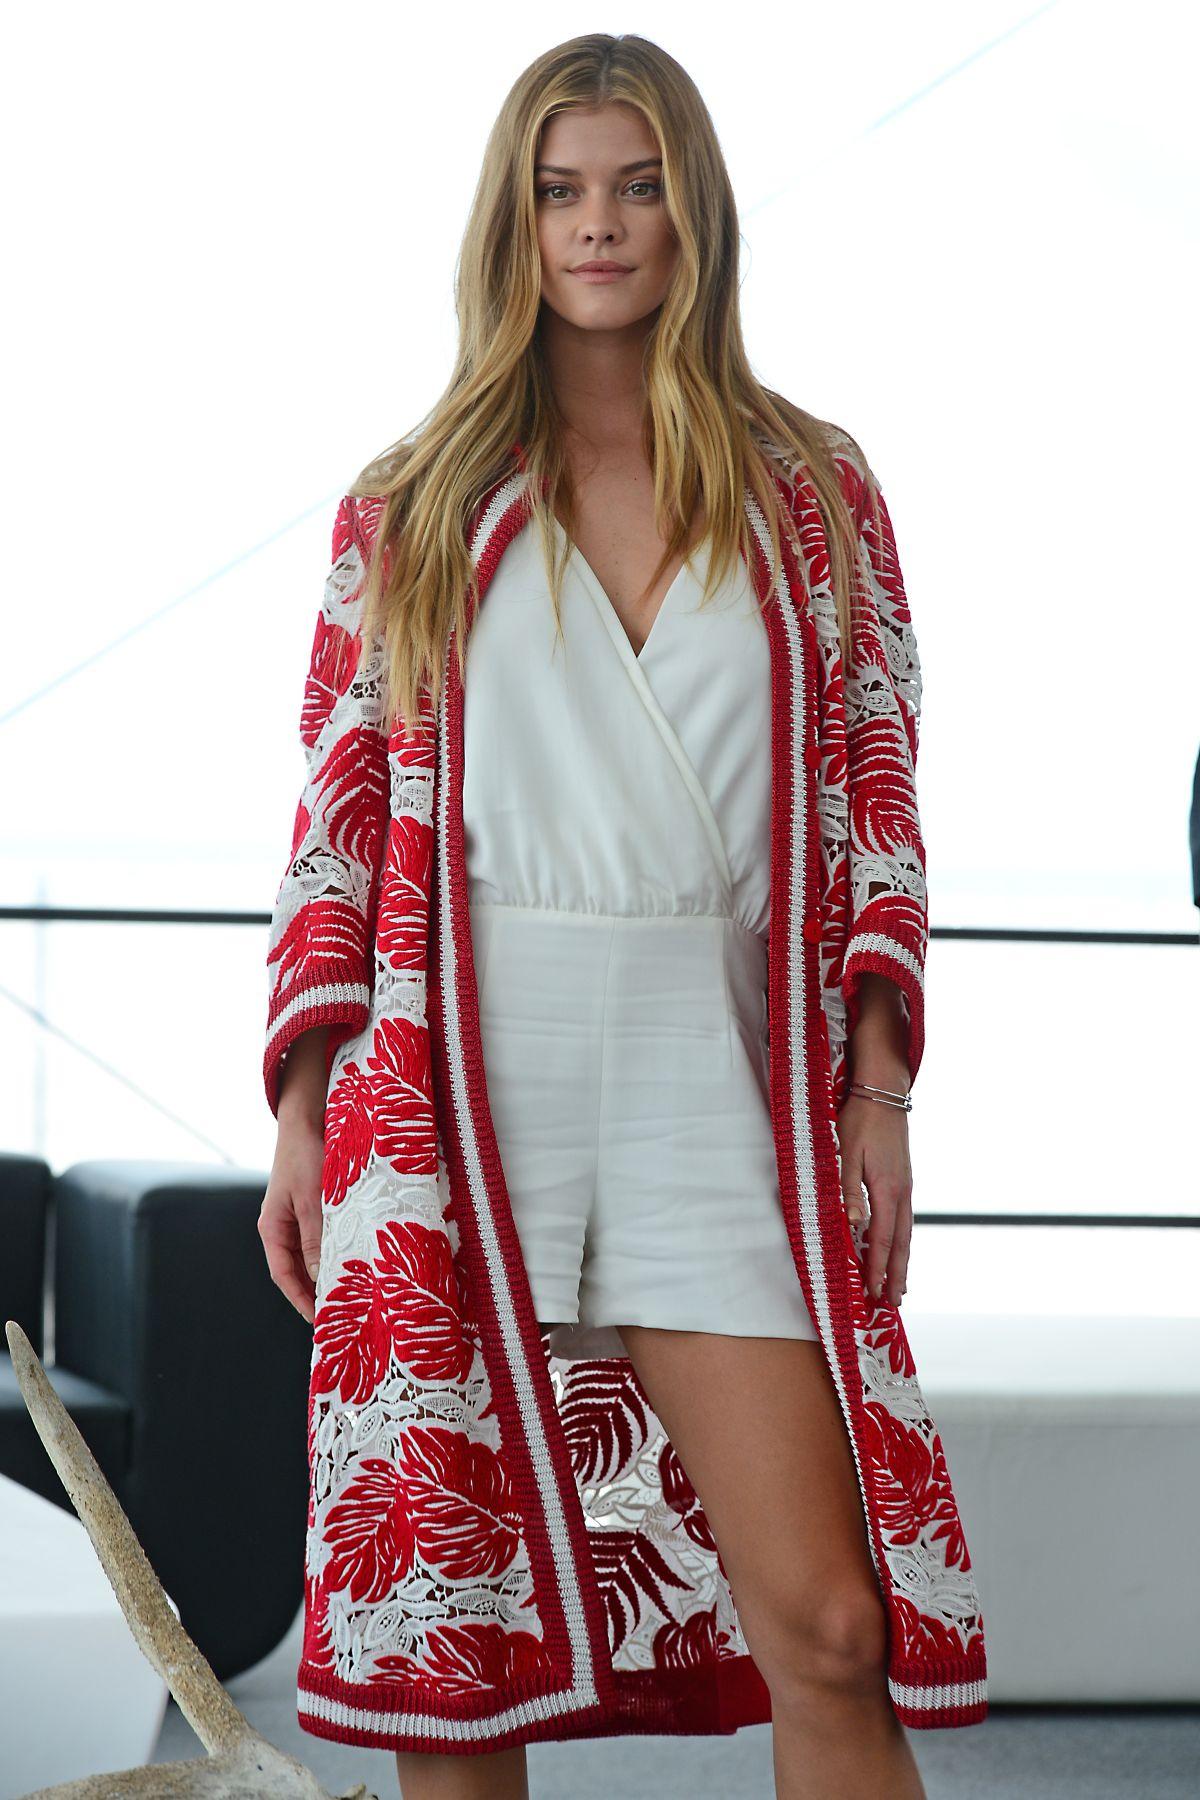 Nina Agdal At Si Swimsuit 2016 Swim Beach In Miami 02 18